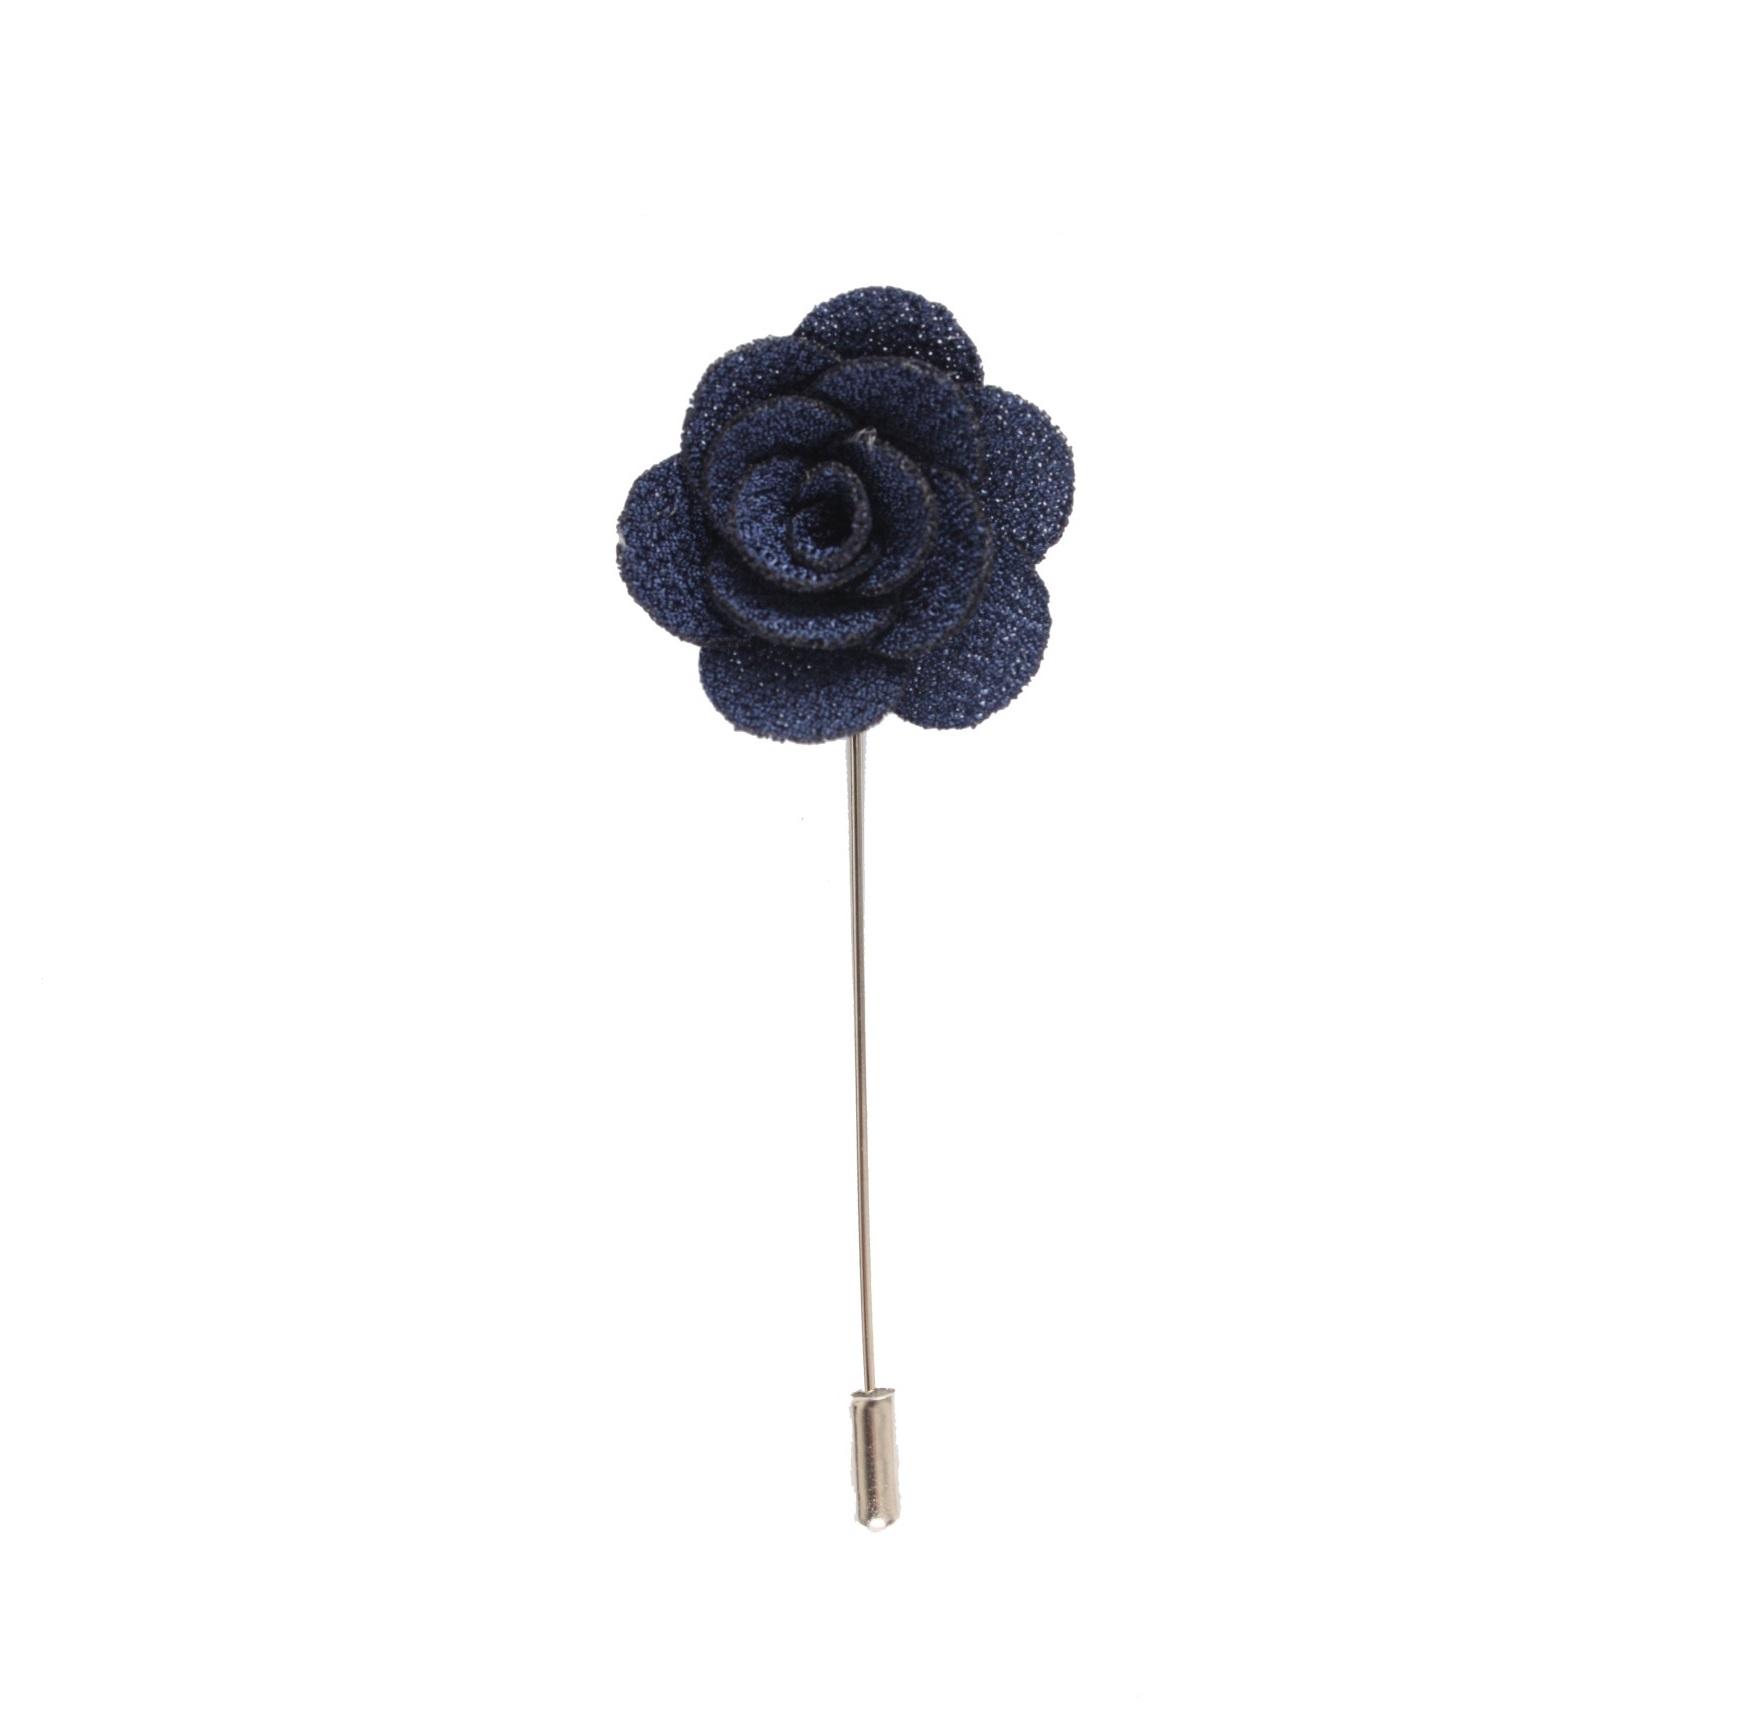 Lapel Pins for Groomsmen